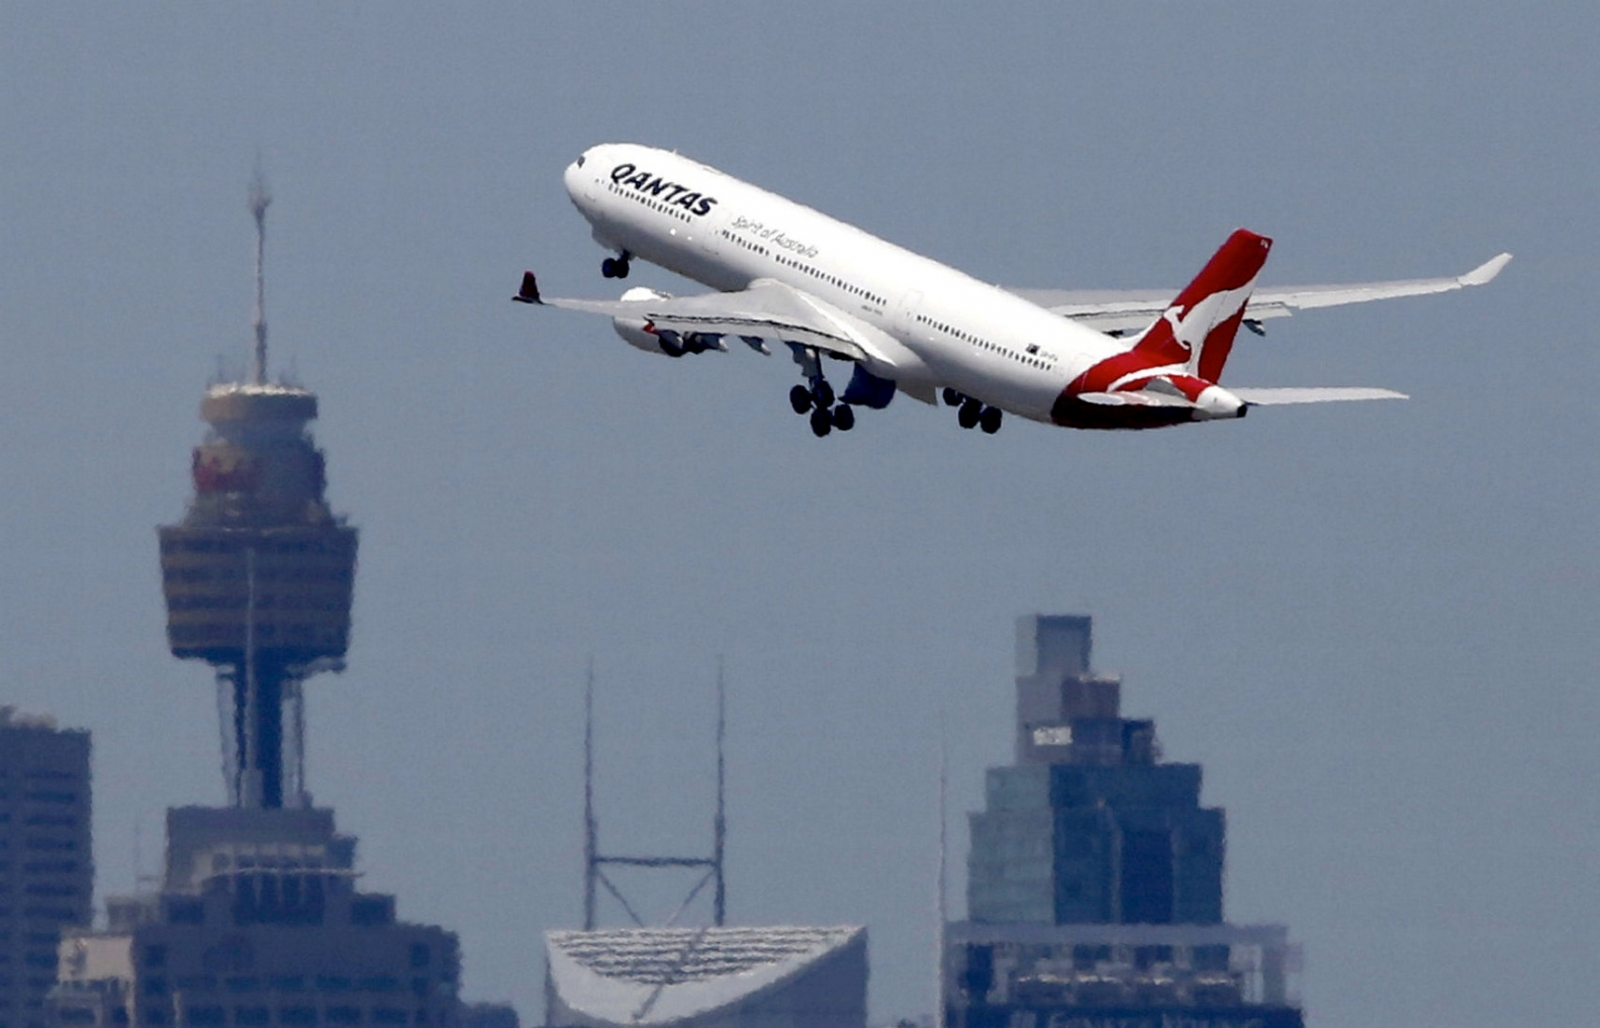 Qantas non-stop London to Sydney flight